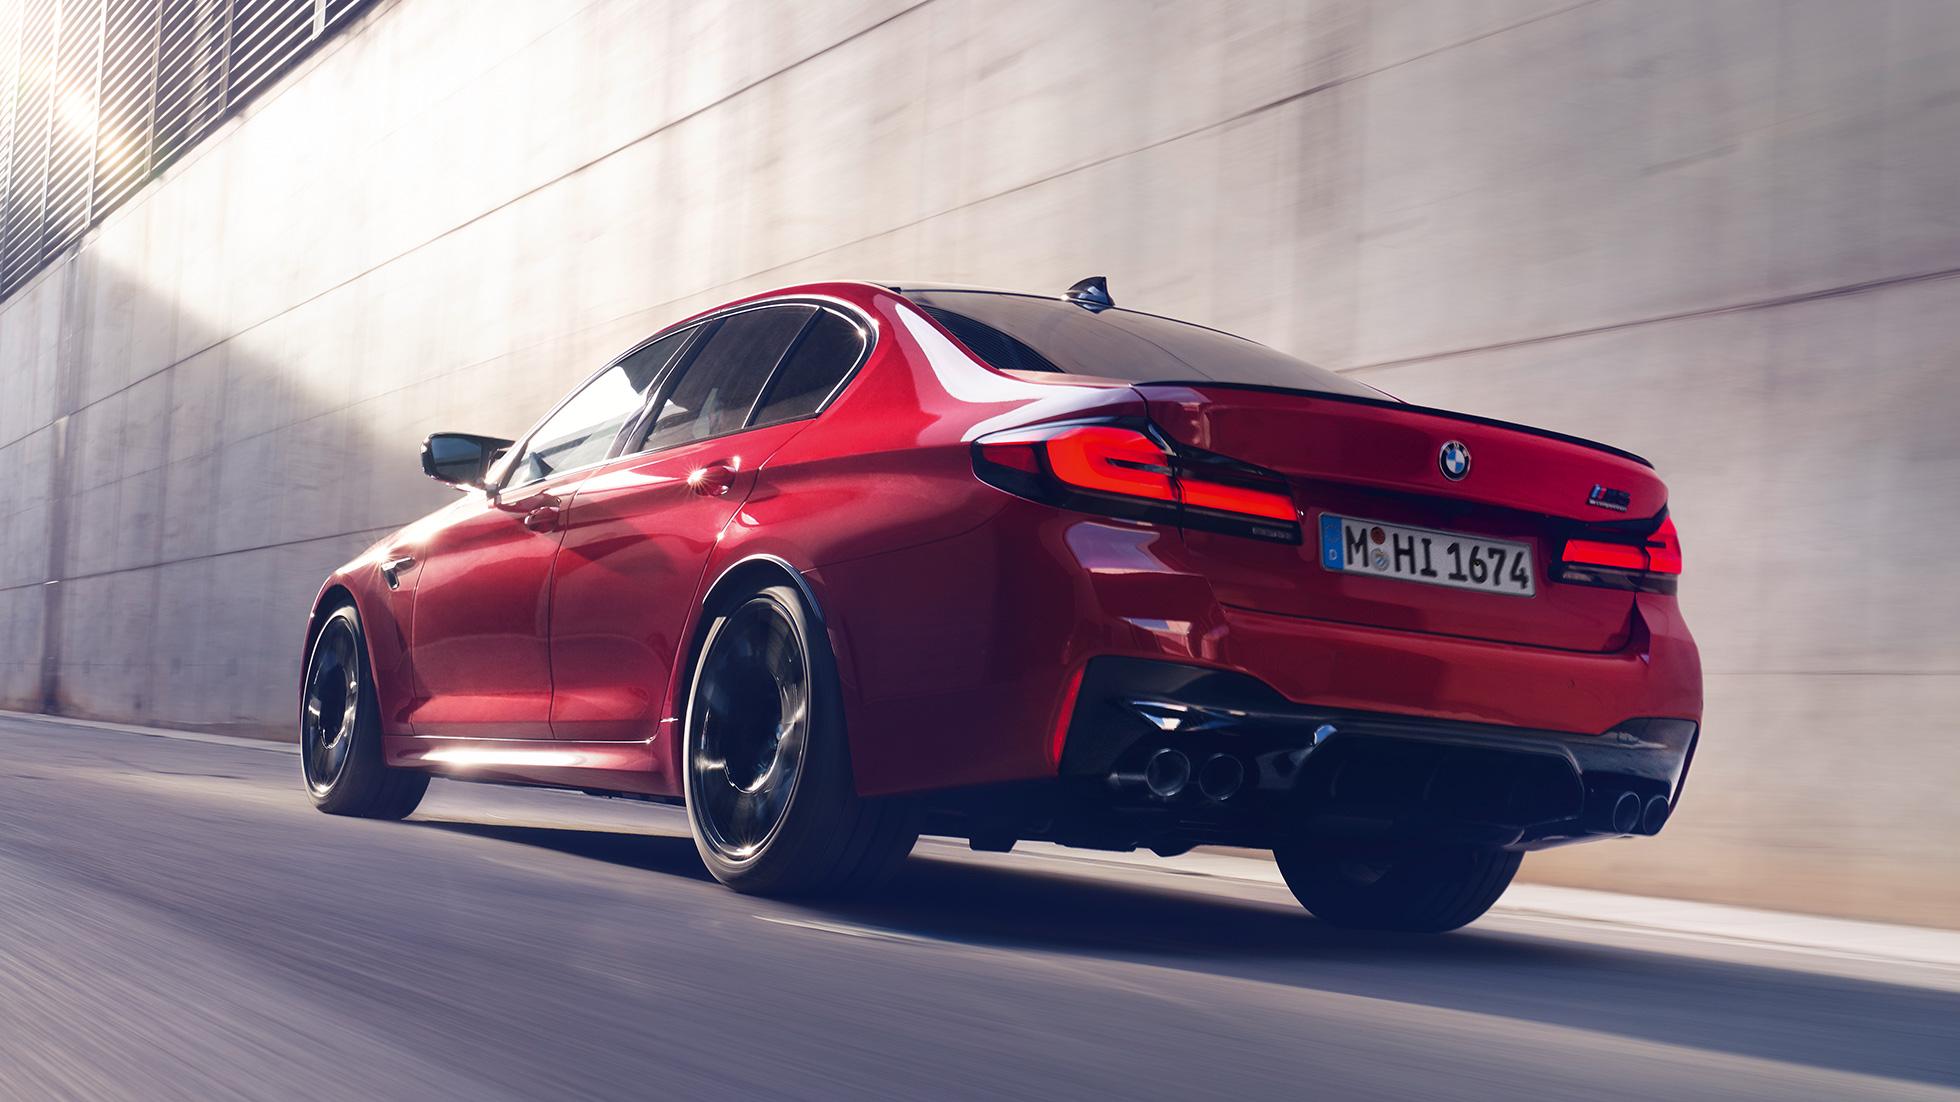 """Горячие пятерки"": в BMW обновили M5 и М5 Competition"